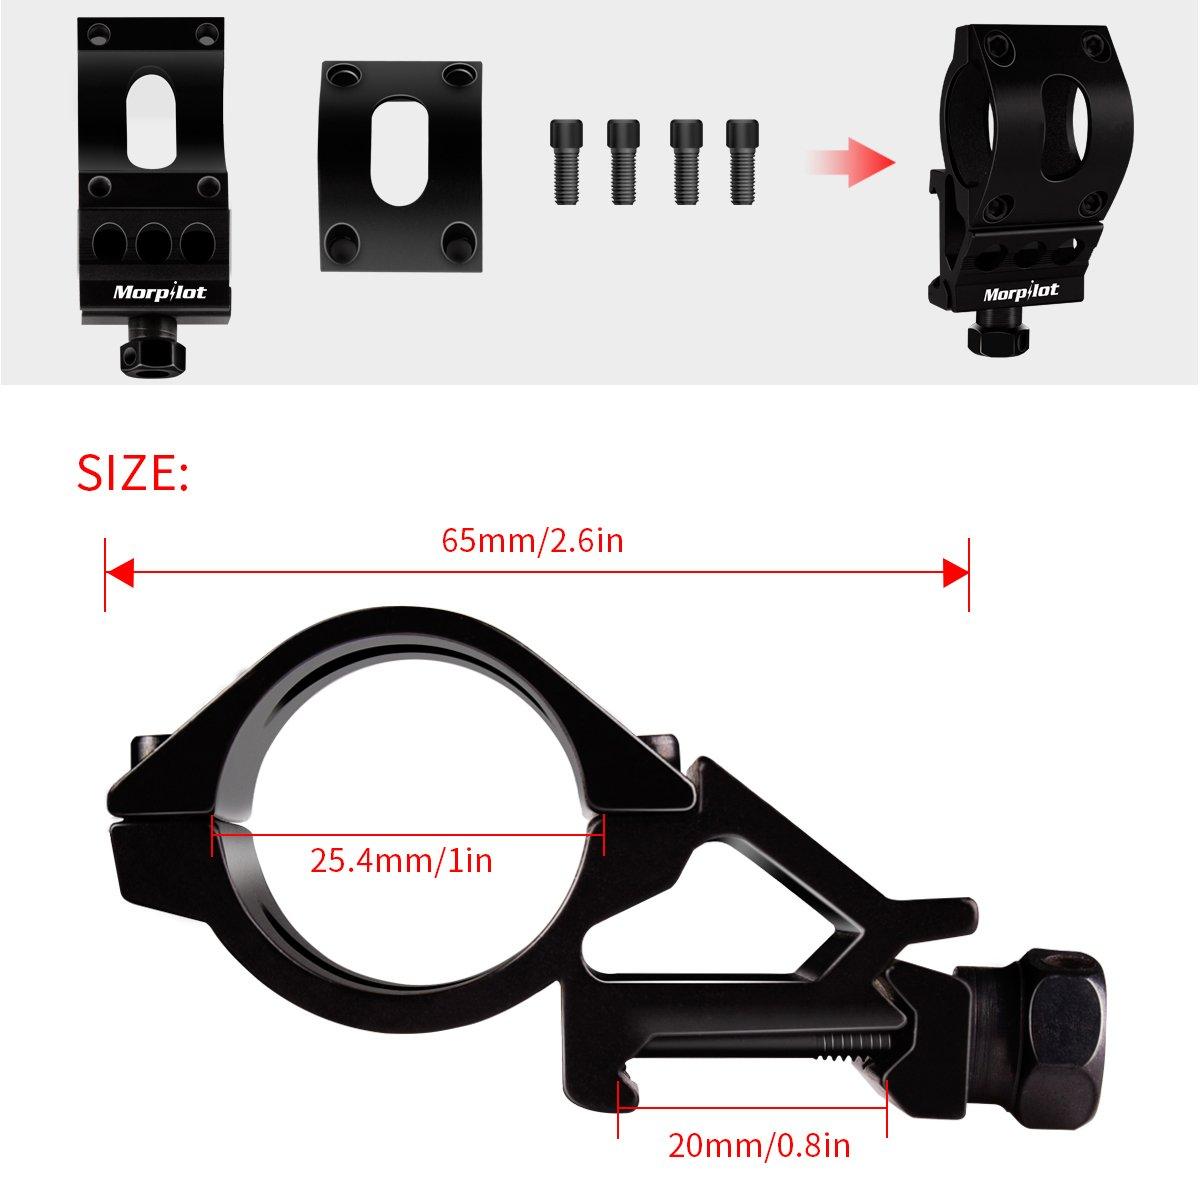 Morpilot Tactical Flashlight Offset Mount Offset Ring Best for Picatinny Weaver Rail, 5 Modes 400LM Handheld Flashlight, Black